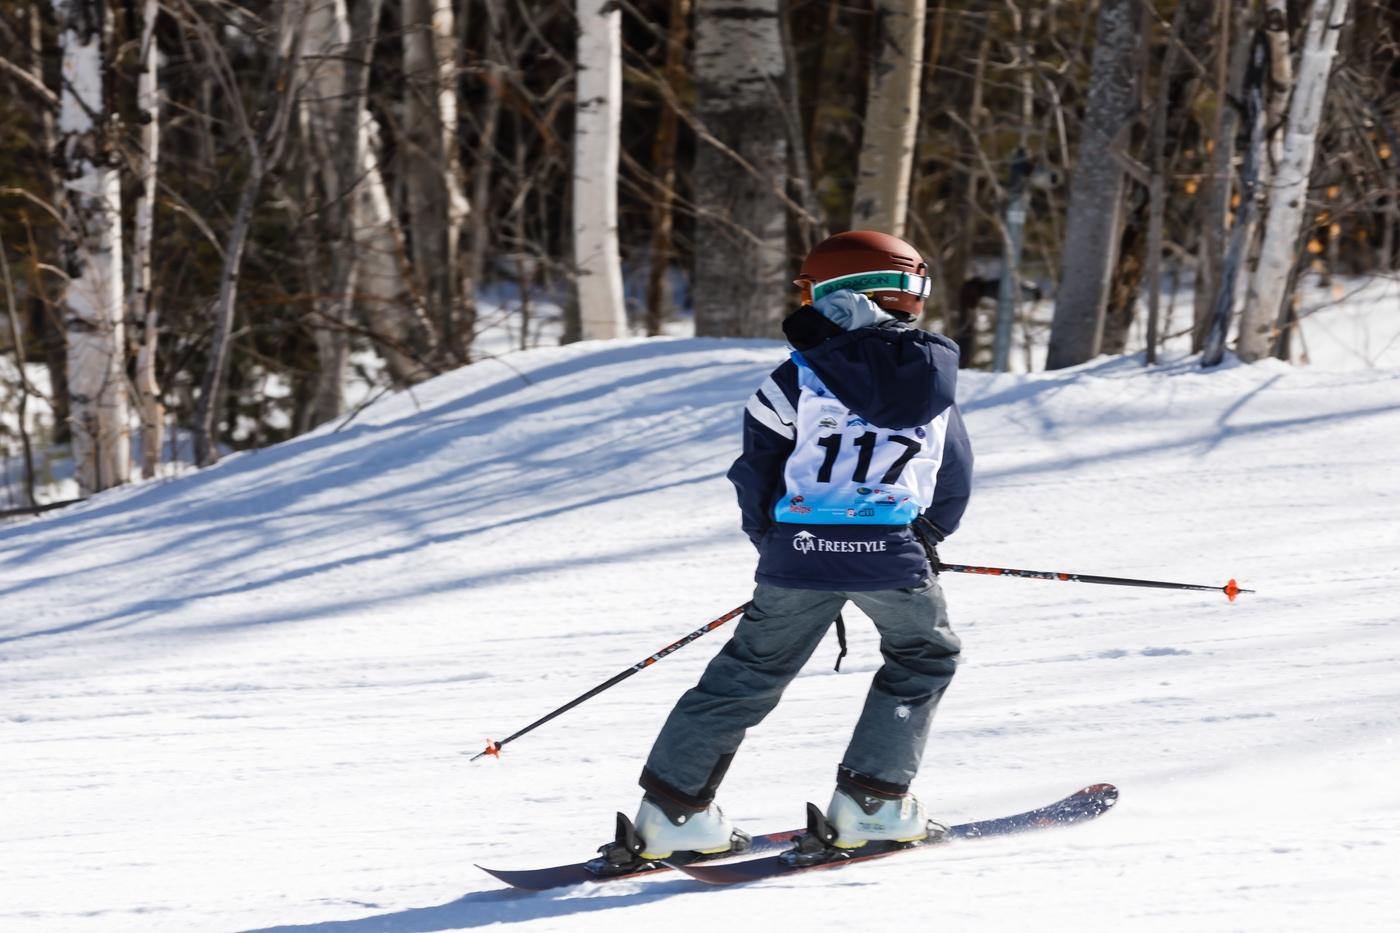 WinterKids Downhill 24 2021 SDP 3125